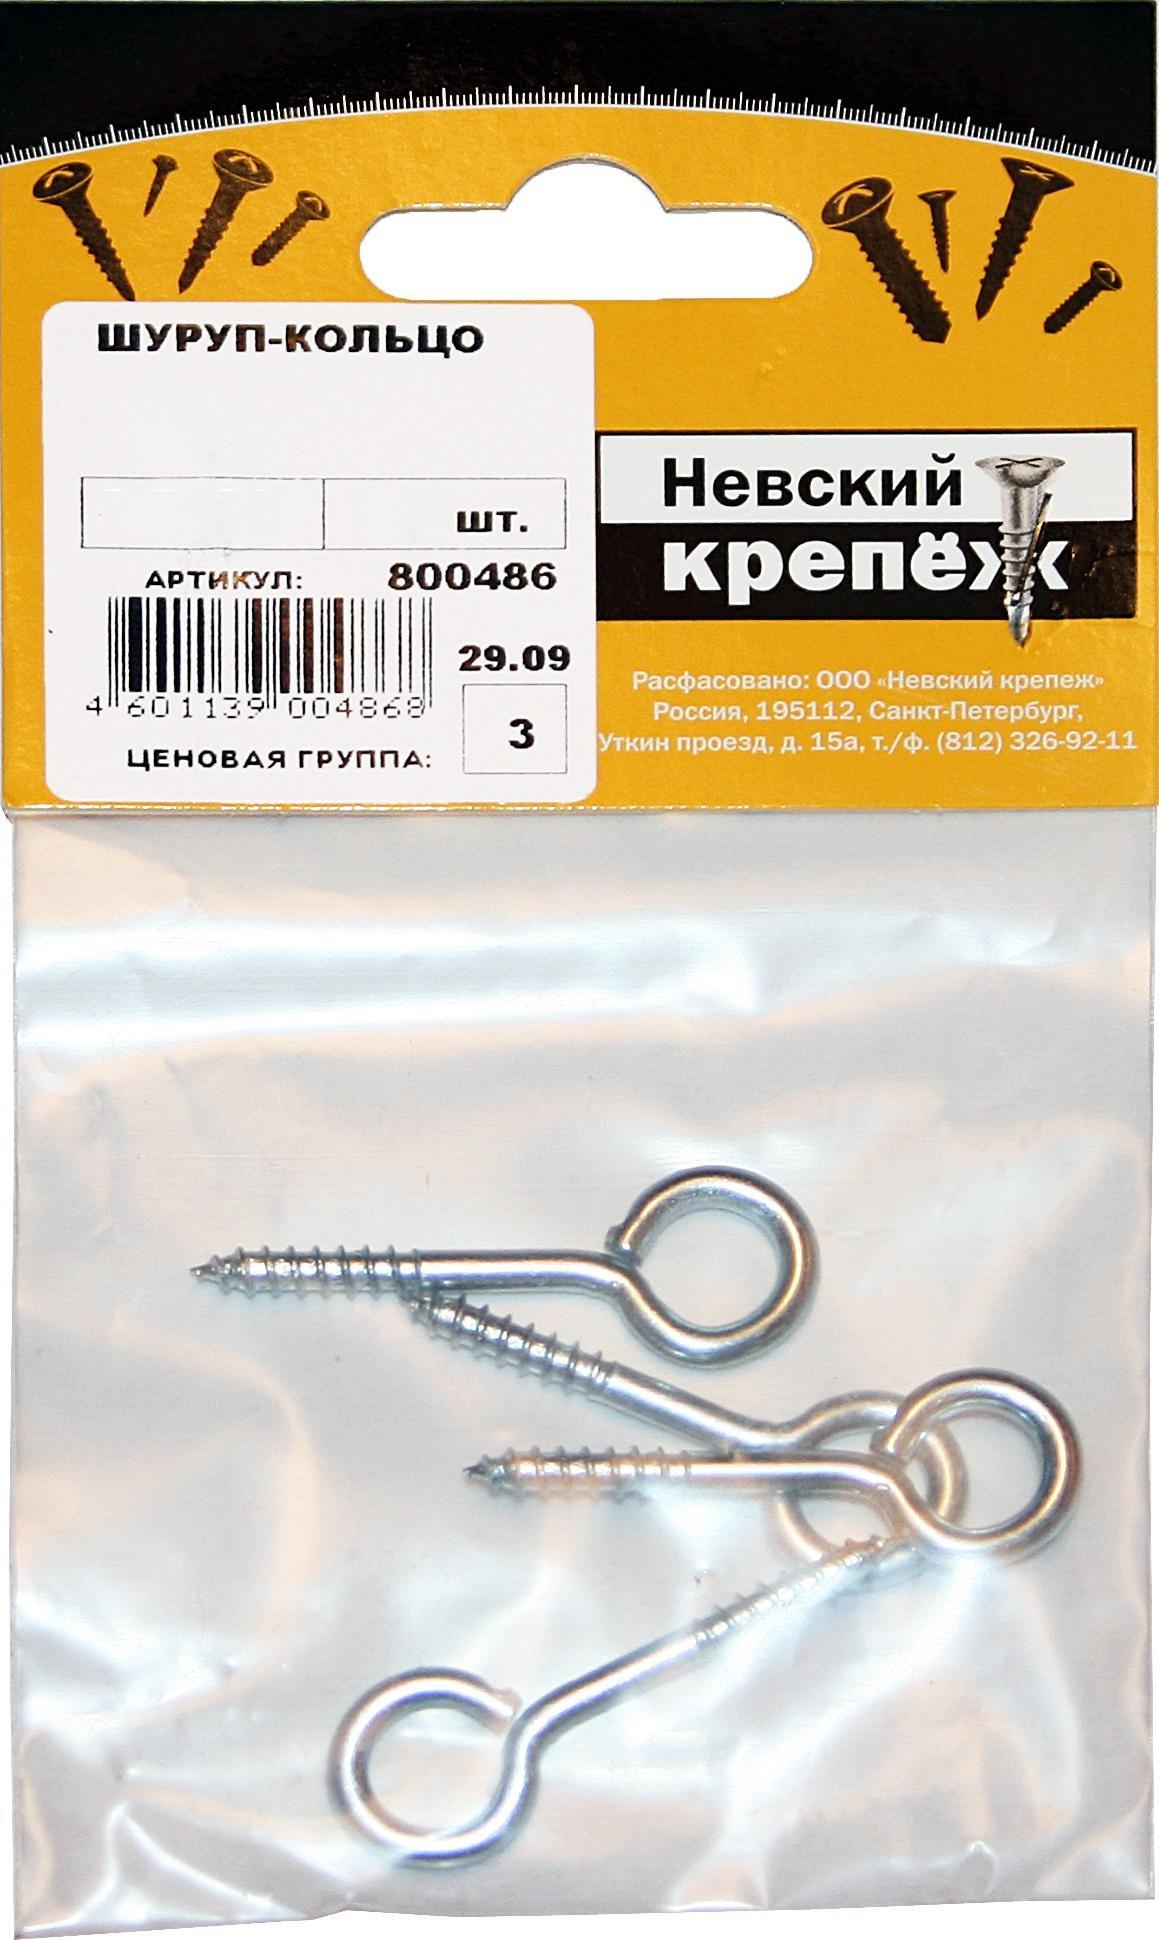 Шуруп-кольцо НЕВСКИЙ КРЕПЕЖ 800488